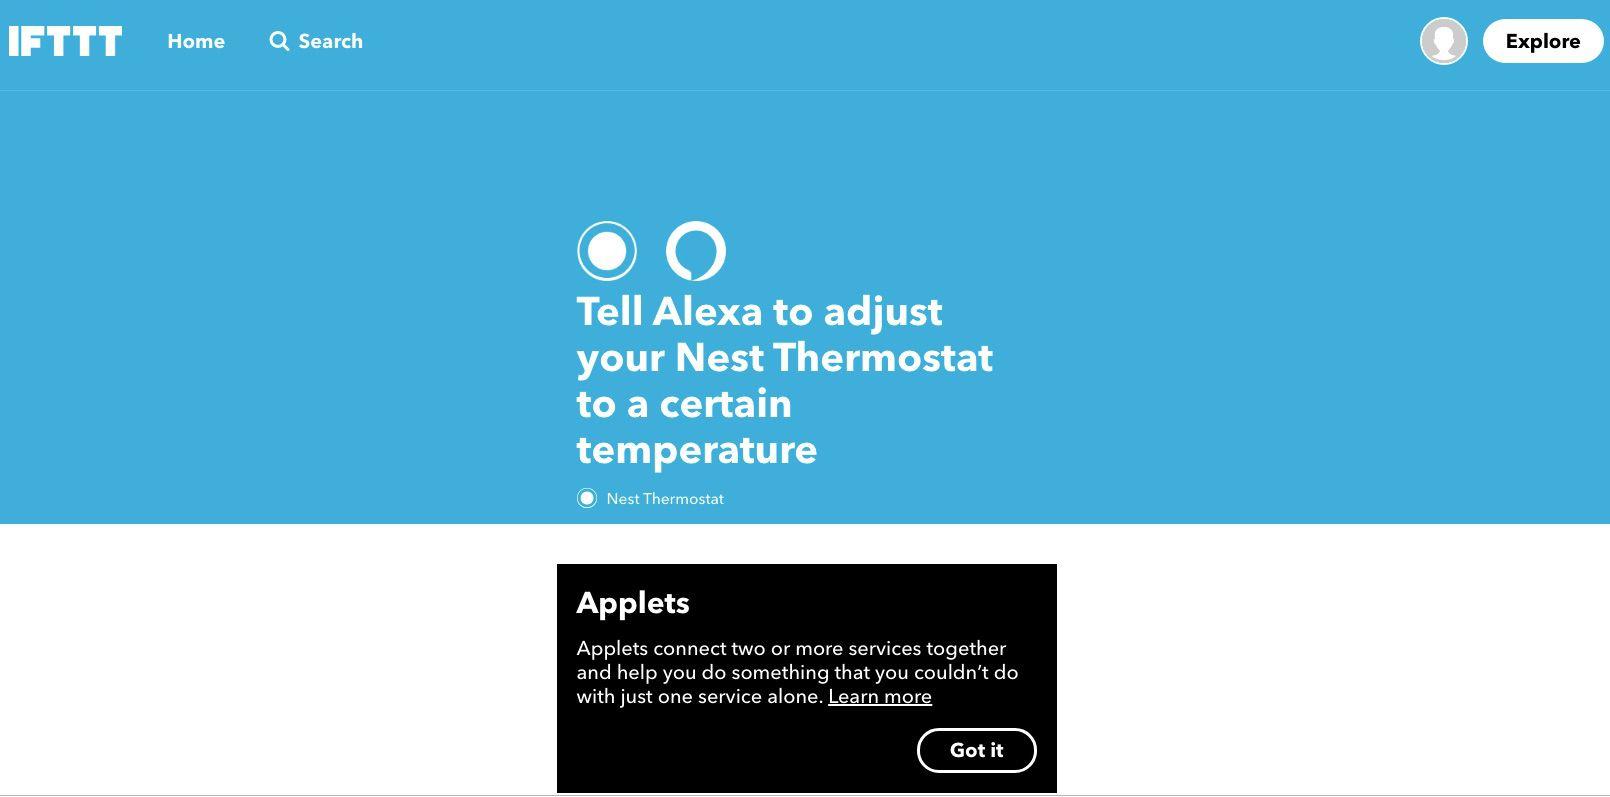 Screenshot of IFTTT applet that tells Alexa to adjust Nest Thermostat